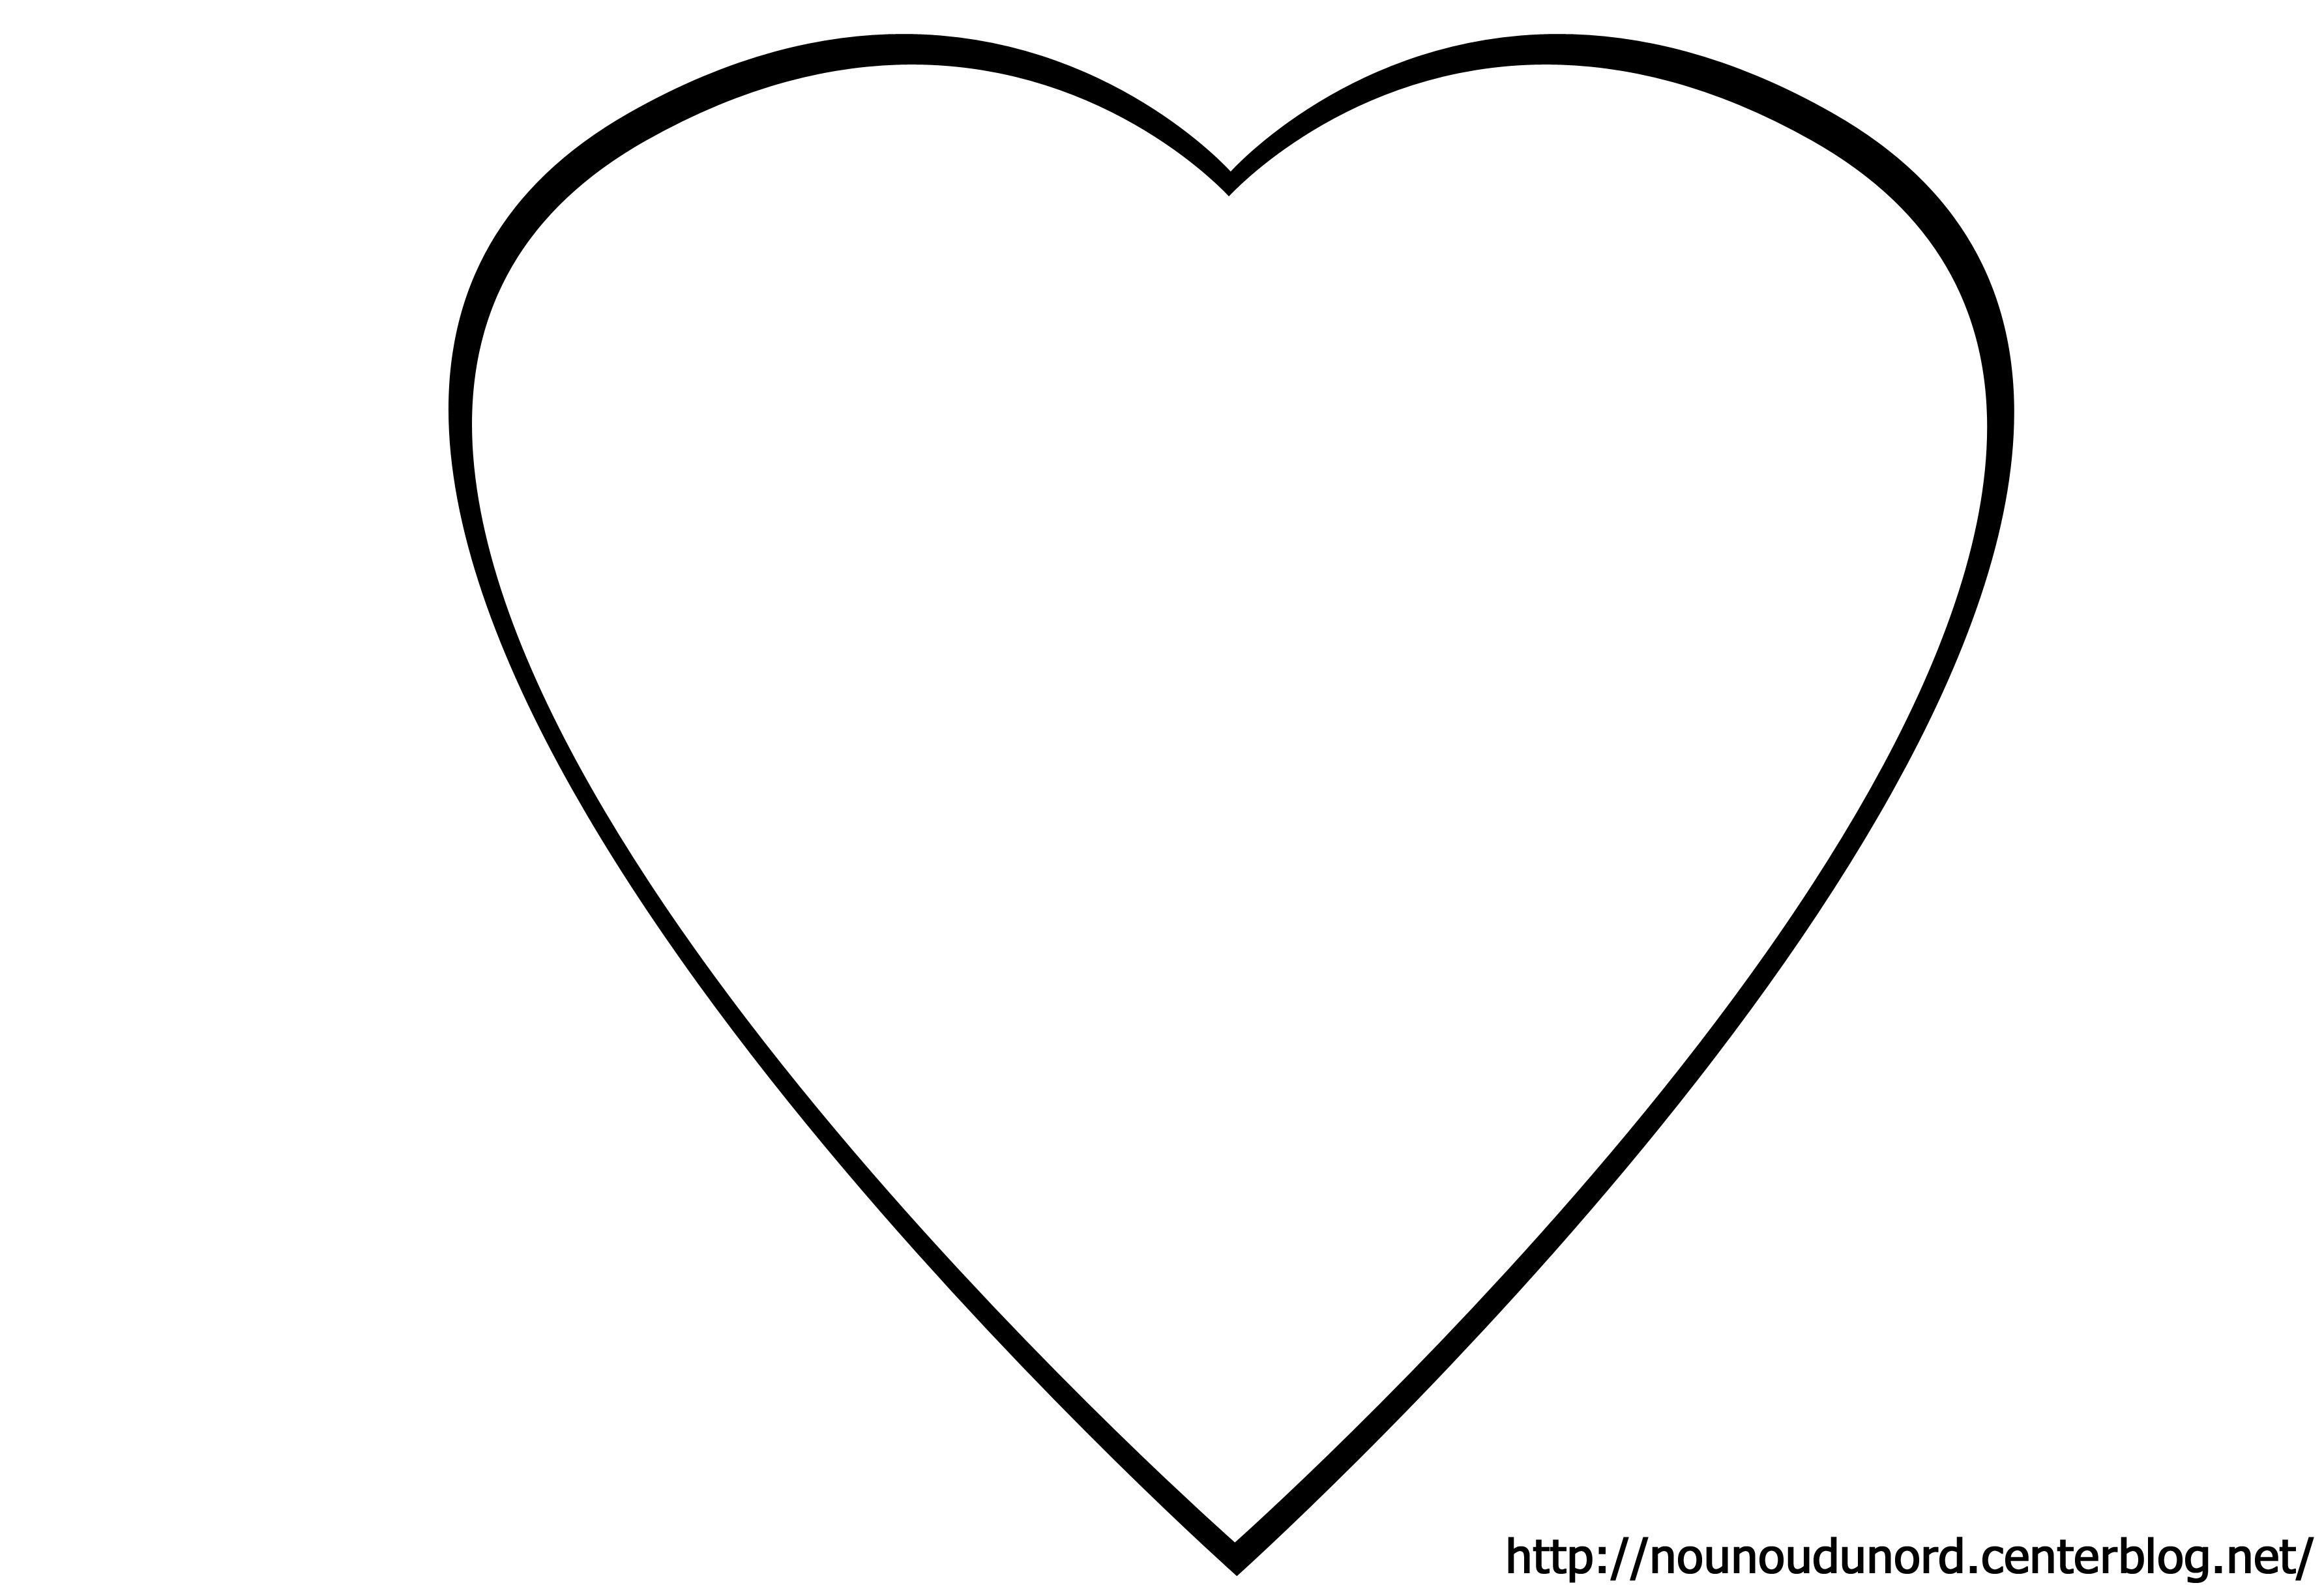 Coloriage coeurs st valentin - Coeur coloriage ...